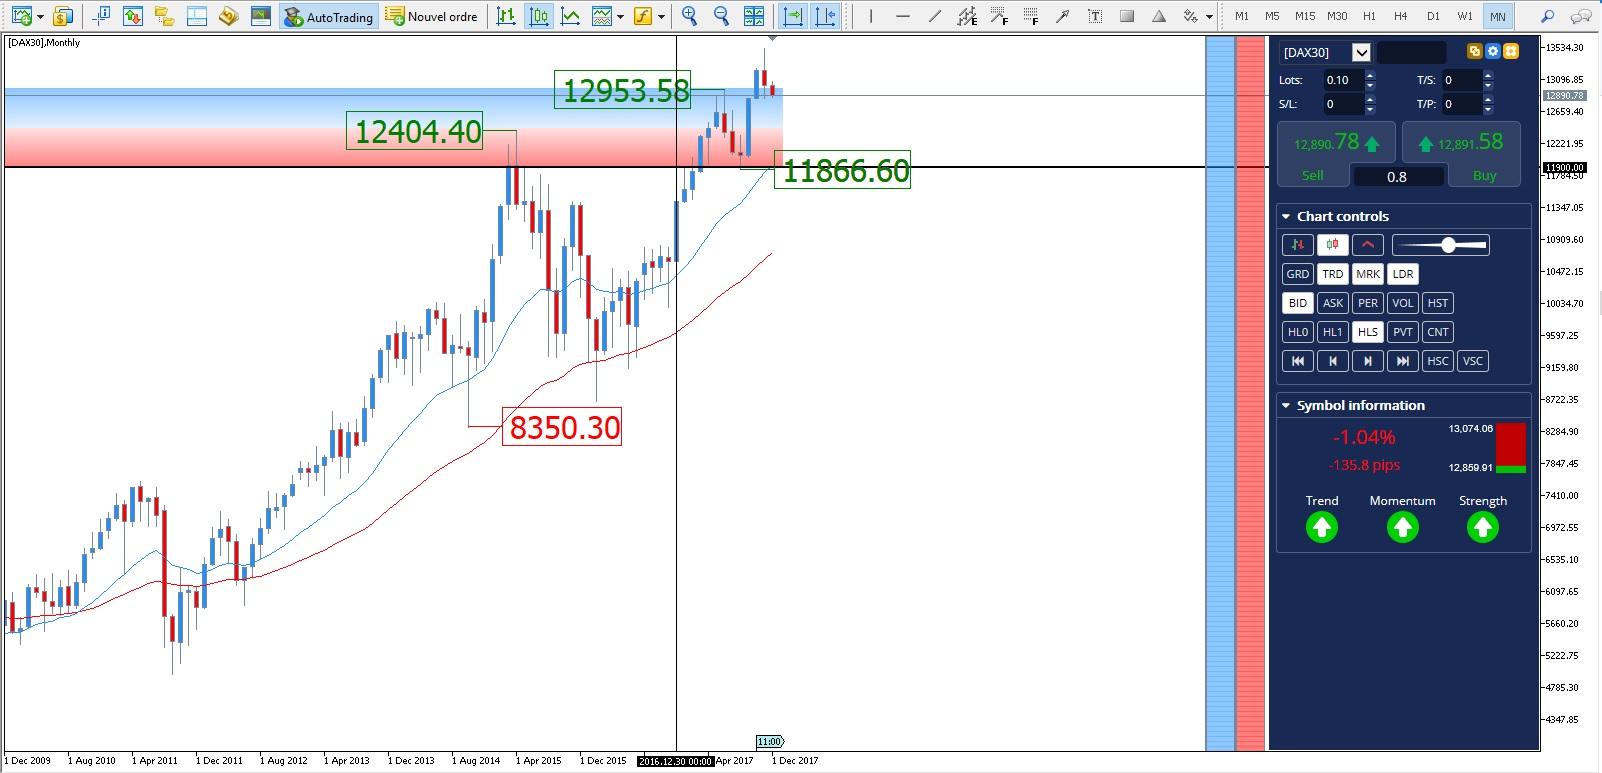 DAX30 análisis gráfico mensual